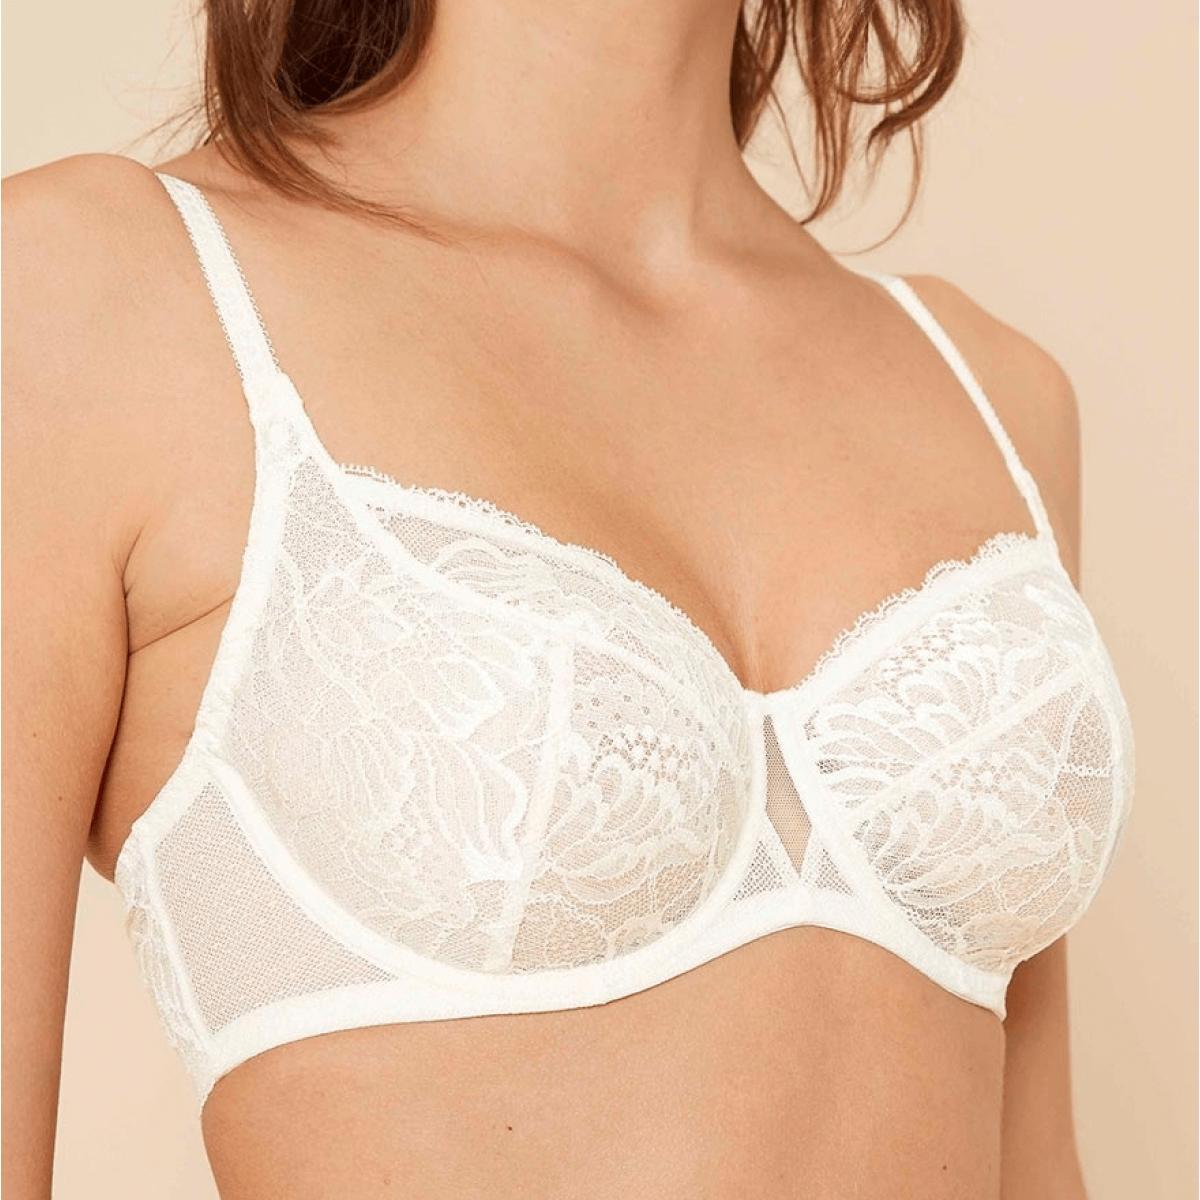 Simone Pérèle bra